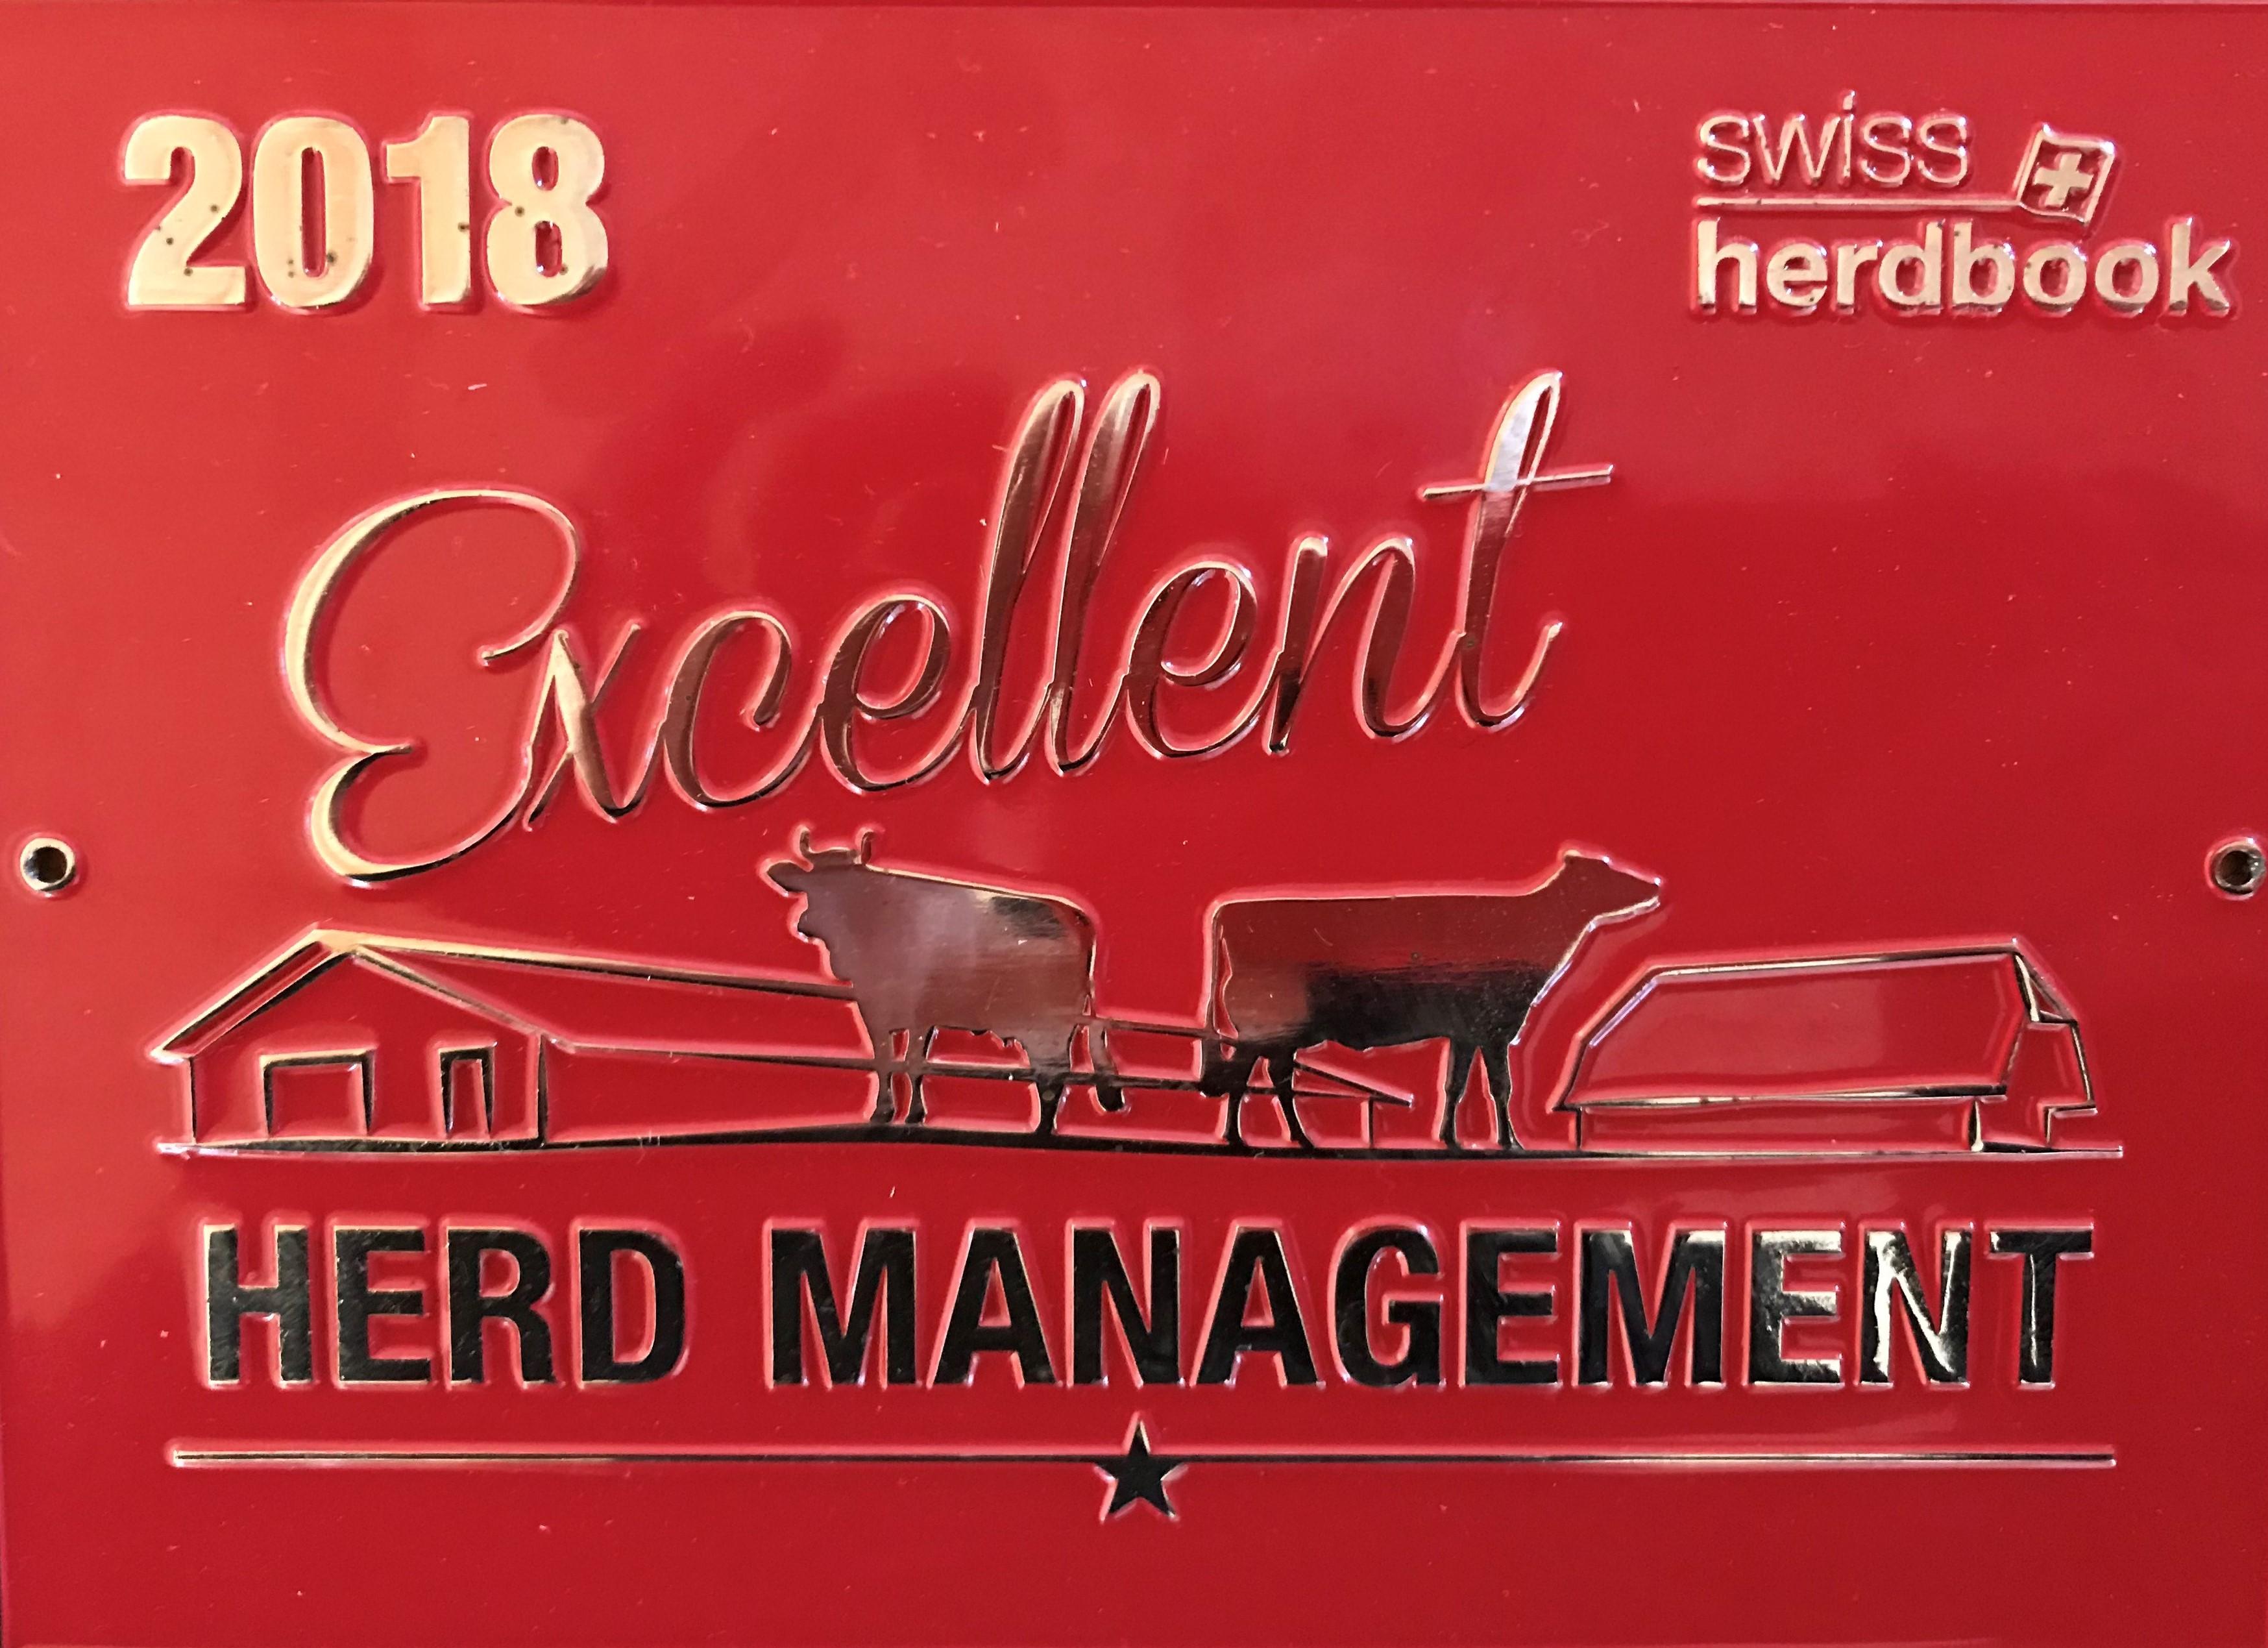 Herd Management